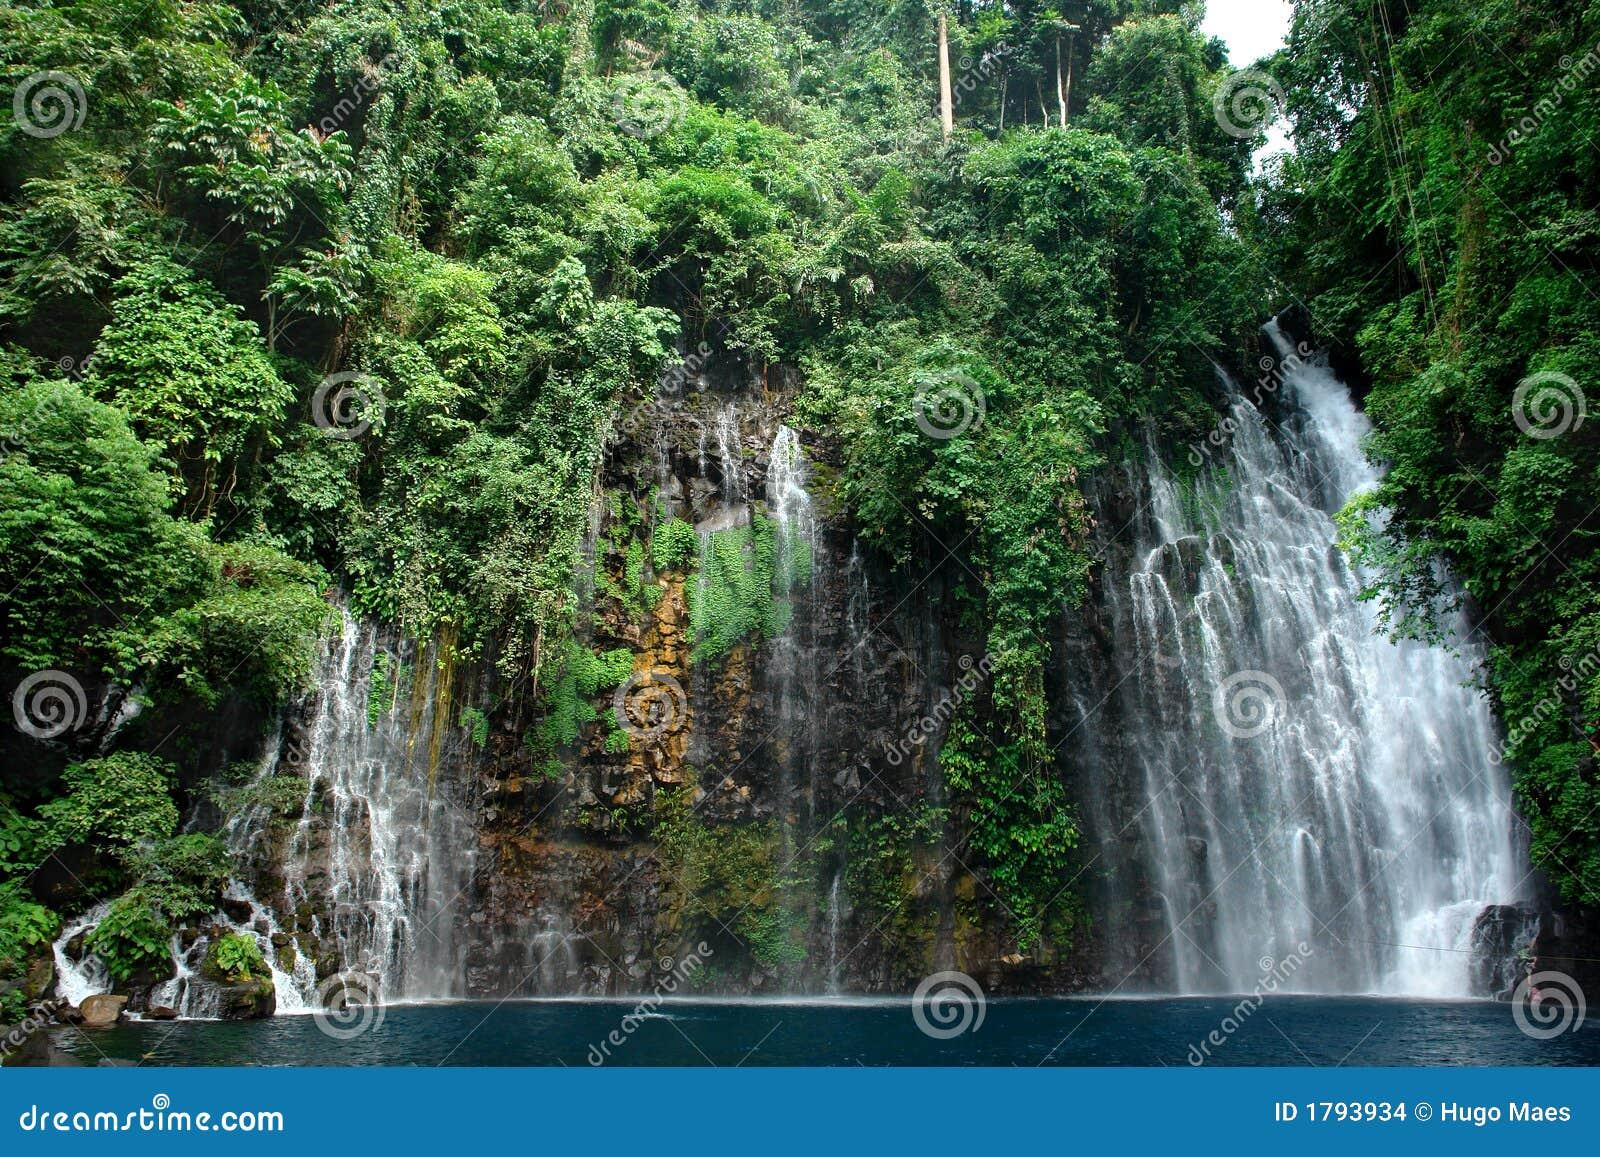 Tropical waterfall in jungle